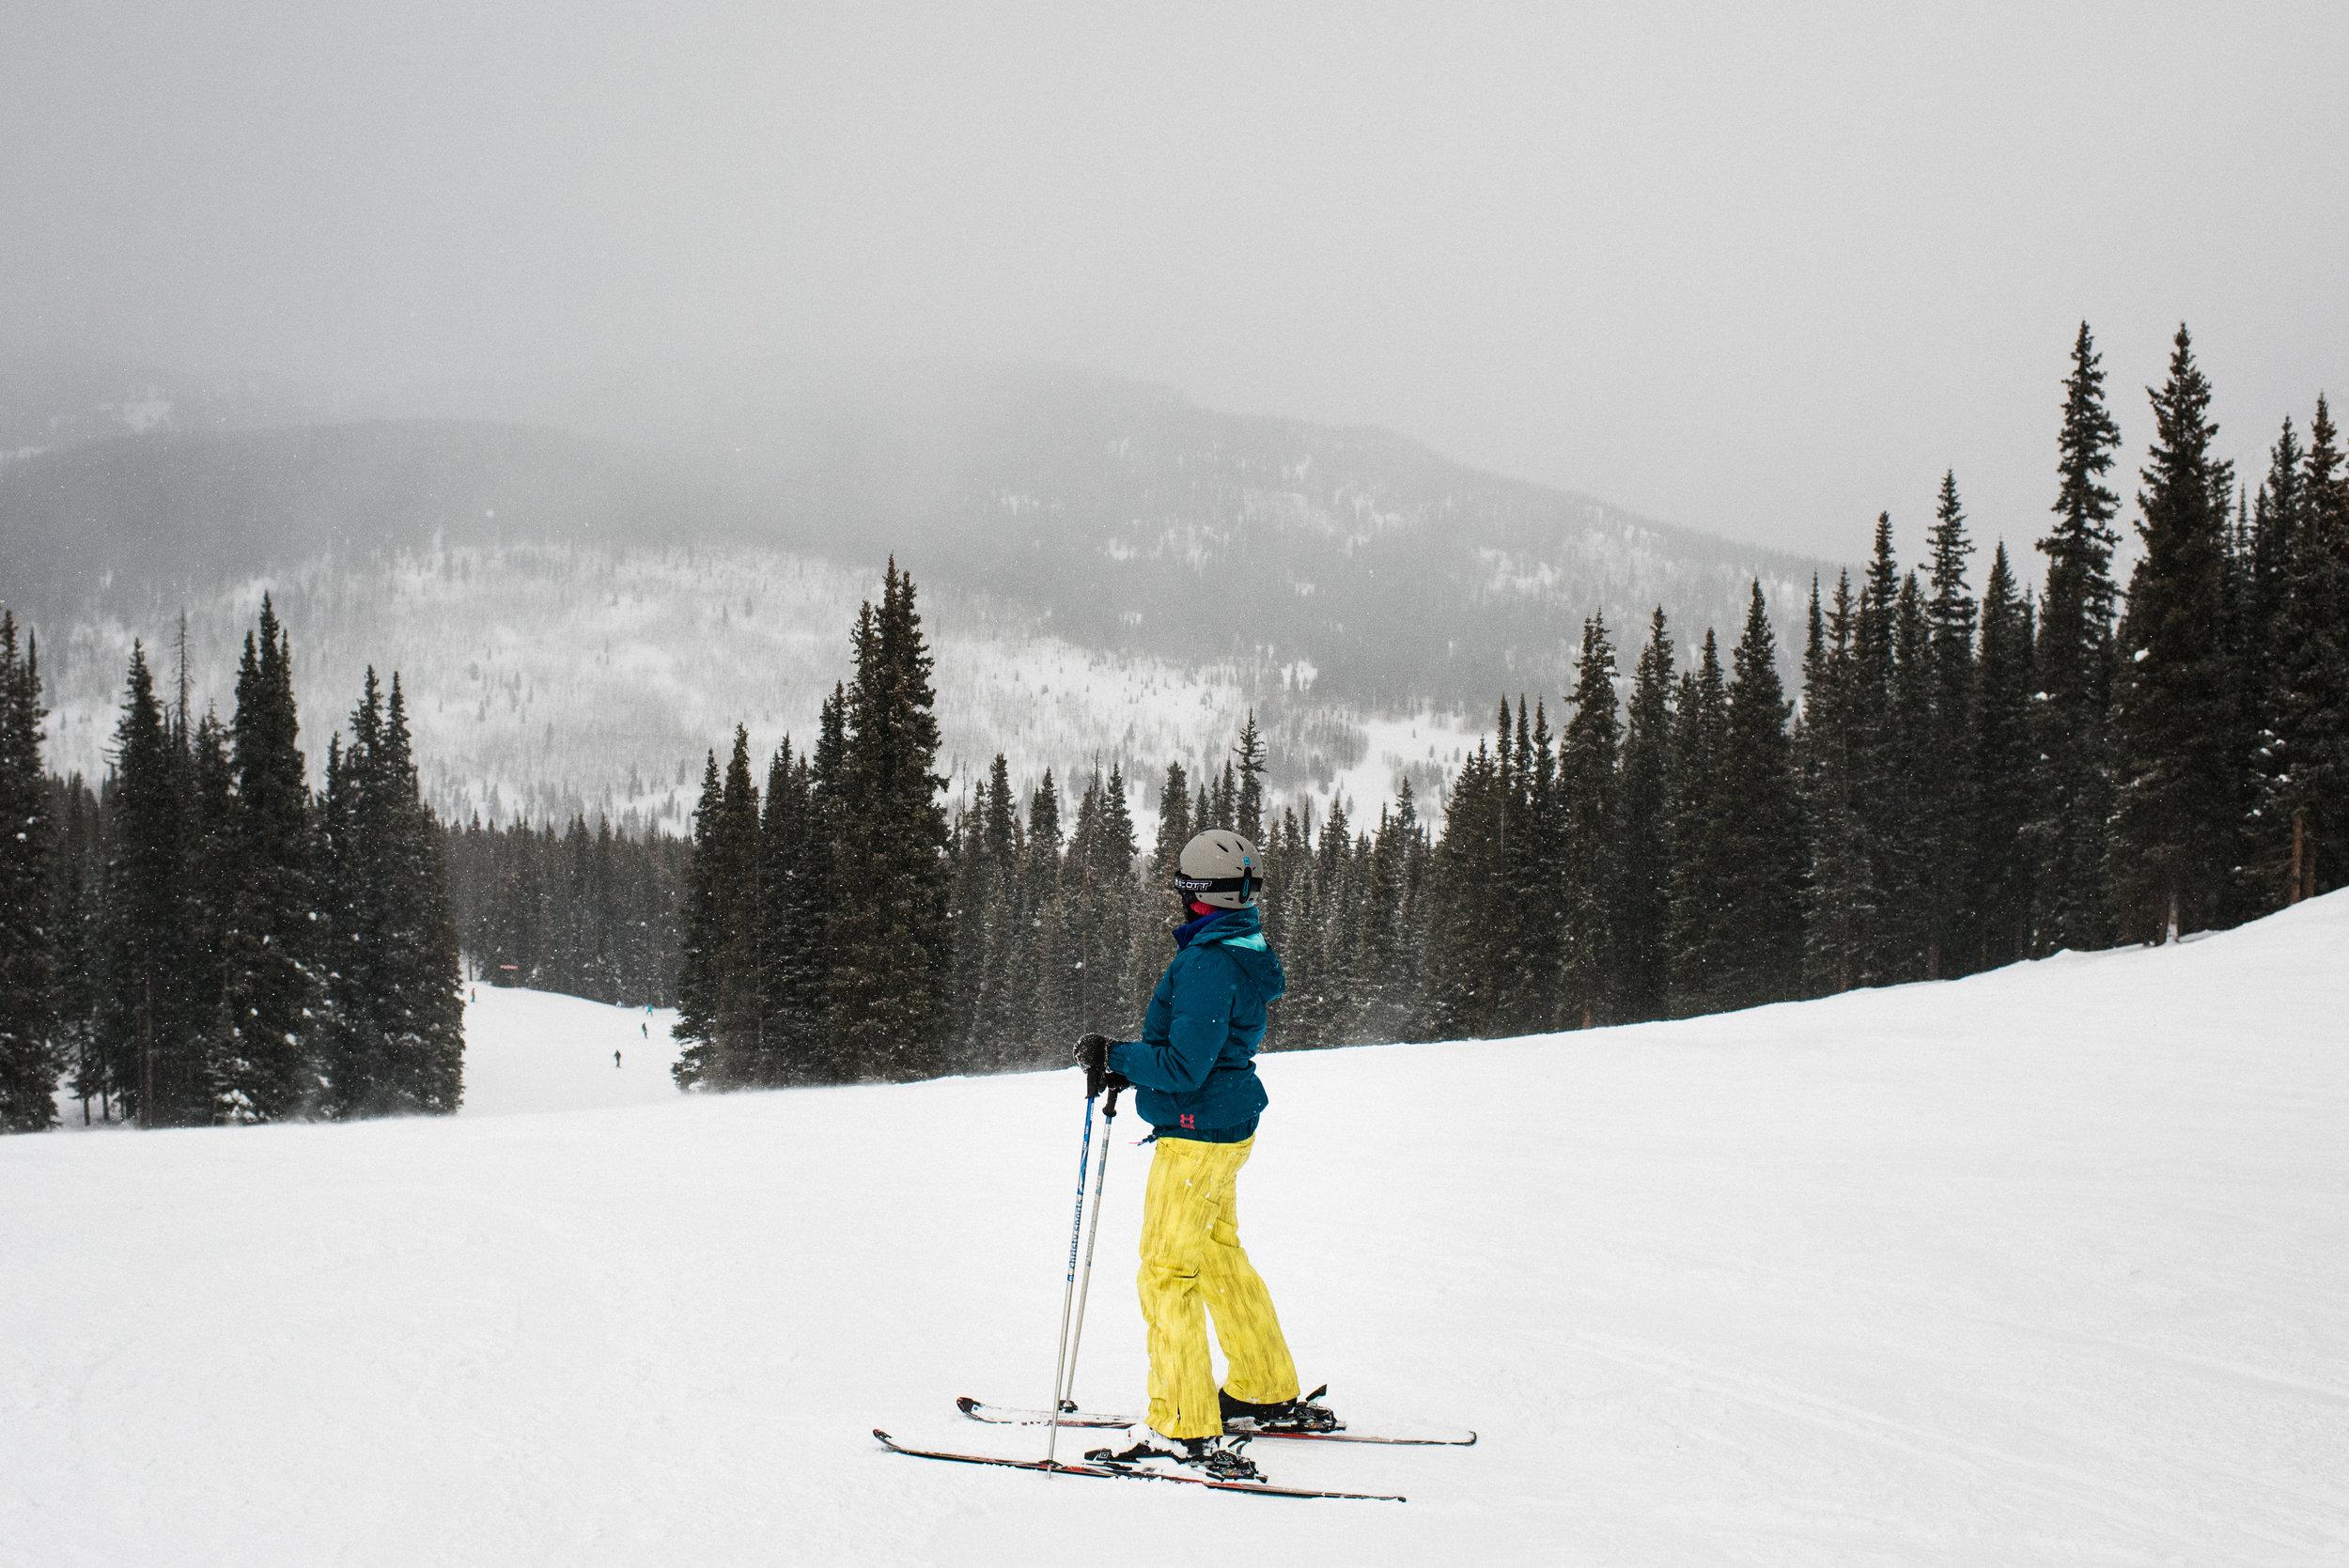 TaraShupe_Outdoor_Photographer_Loweprobags_Colorado_Copper_Mountains_Ski_09.jpg